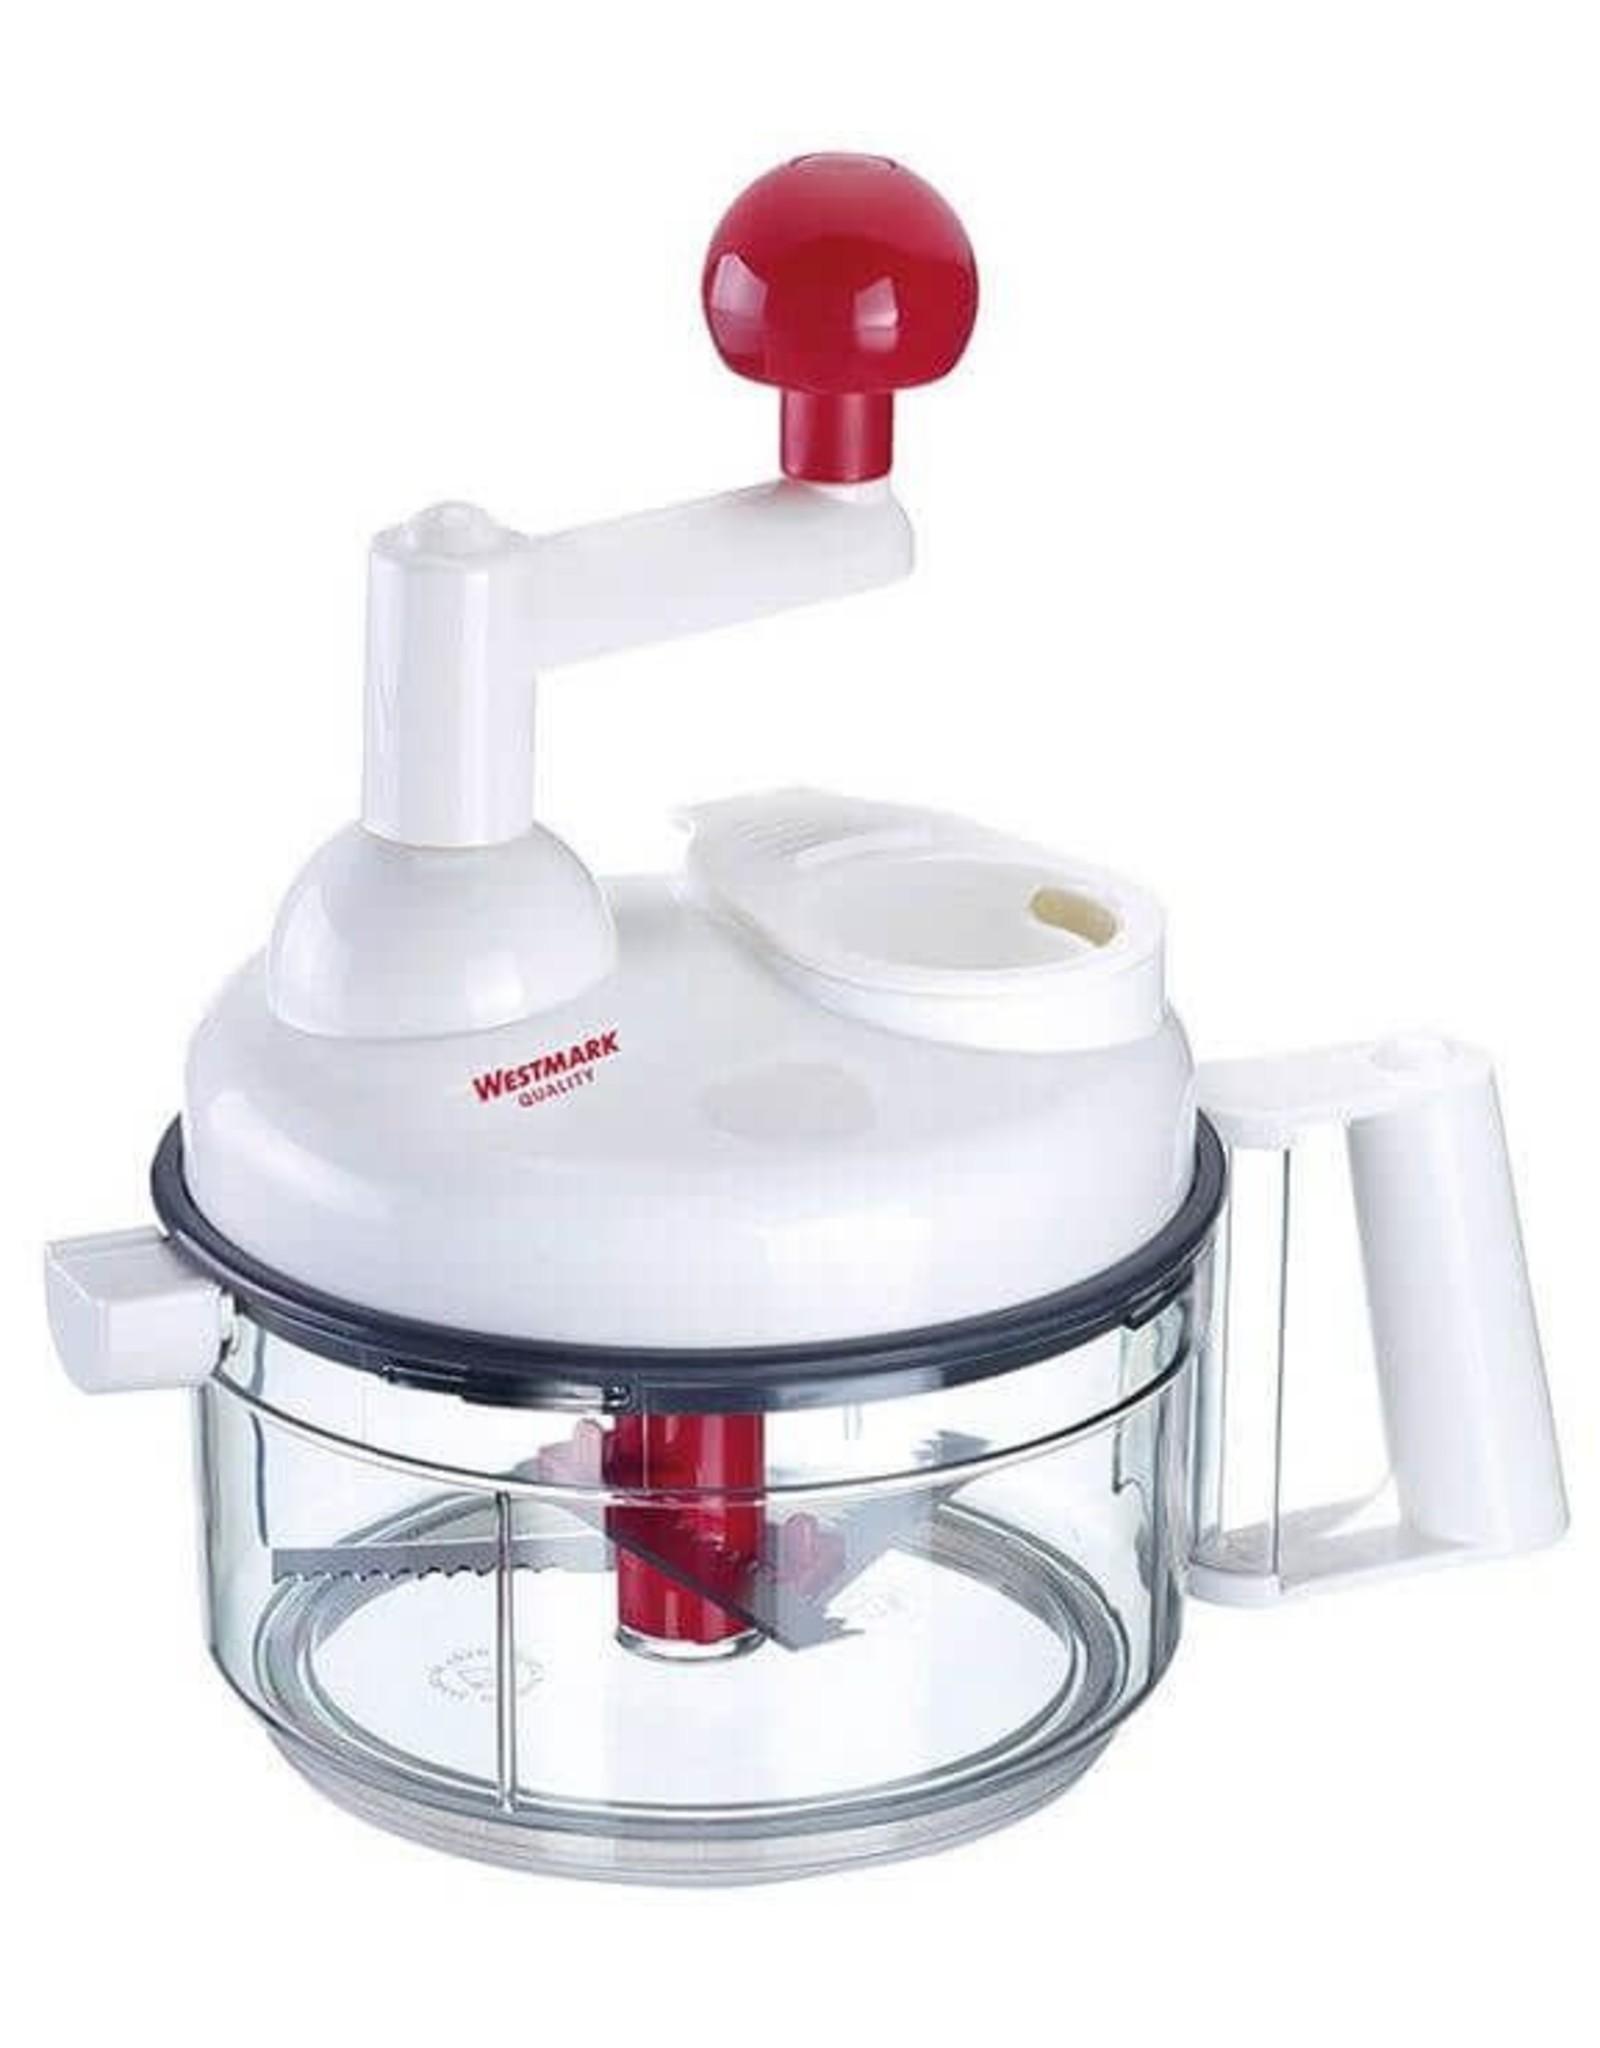 westmark Westmark Multi-Kulti handmatige keukenmachine 10-delig